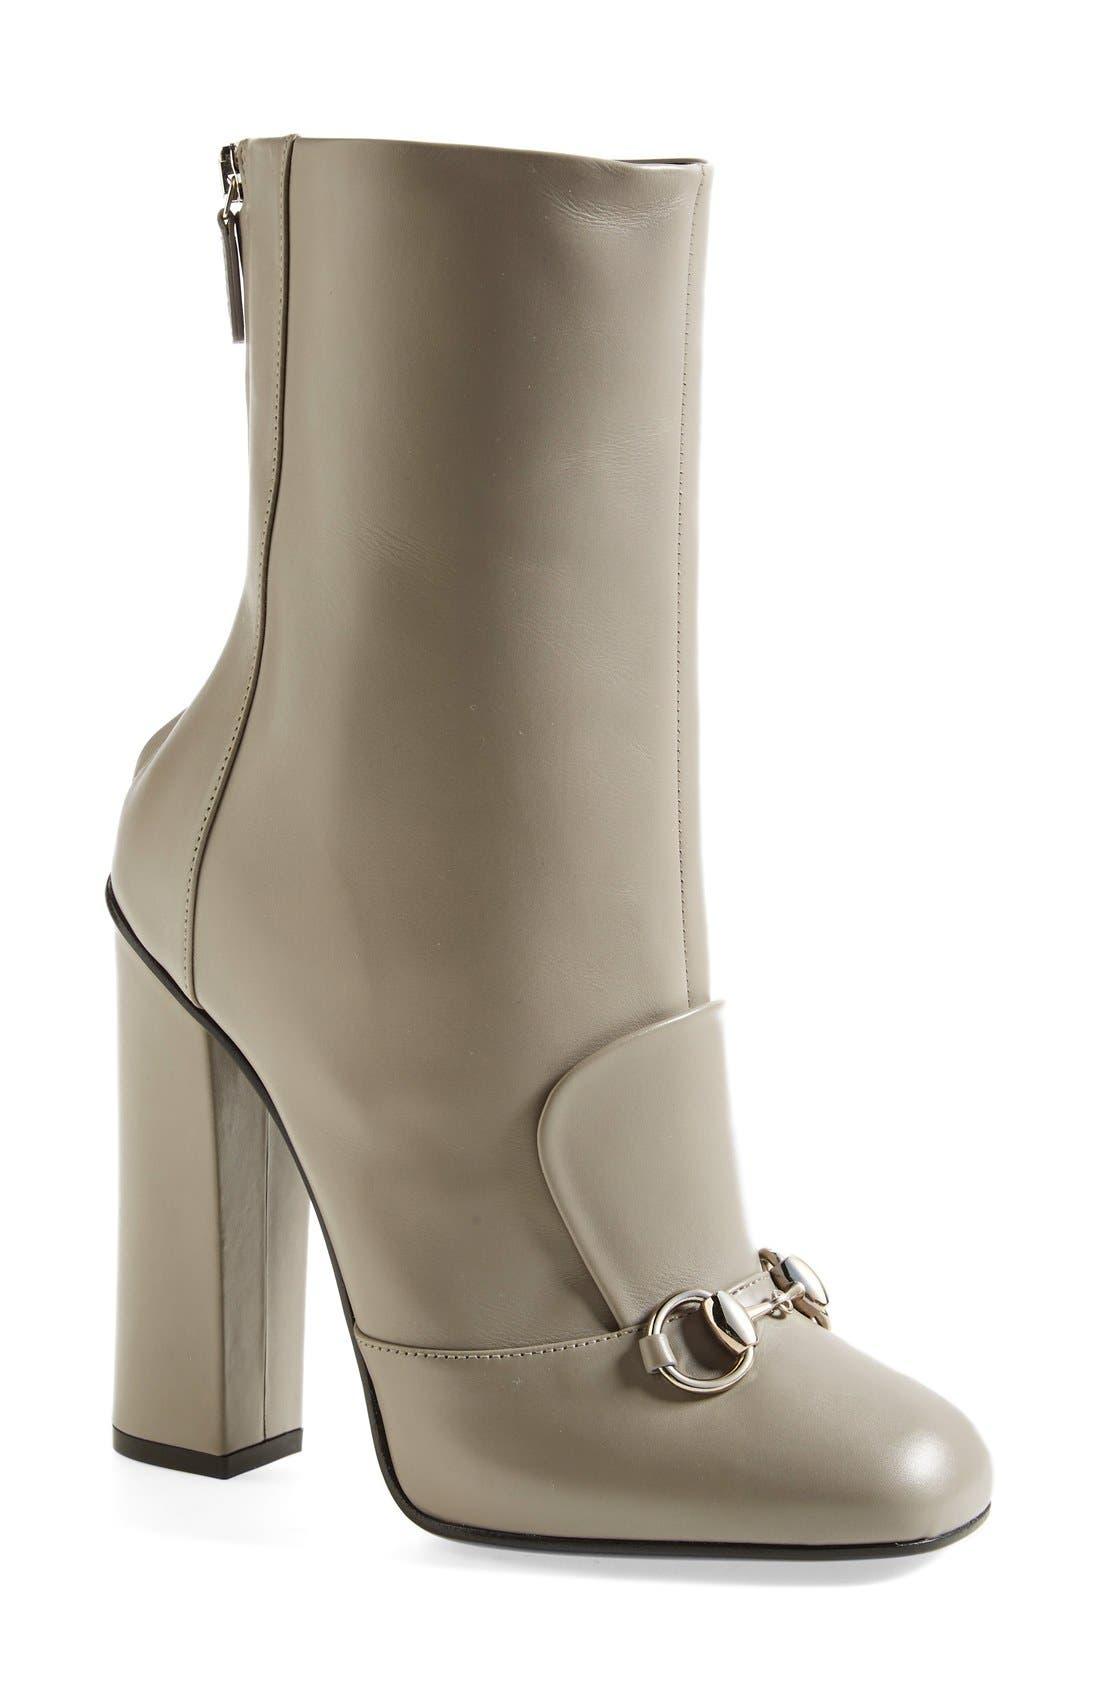 Main Image - Gucci 'Lillian' Bit Boot (Women)